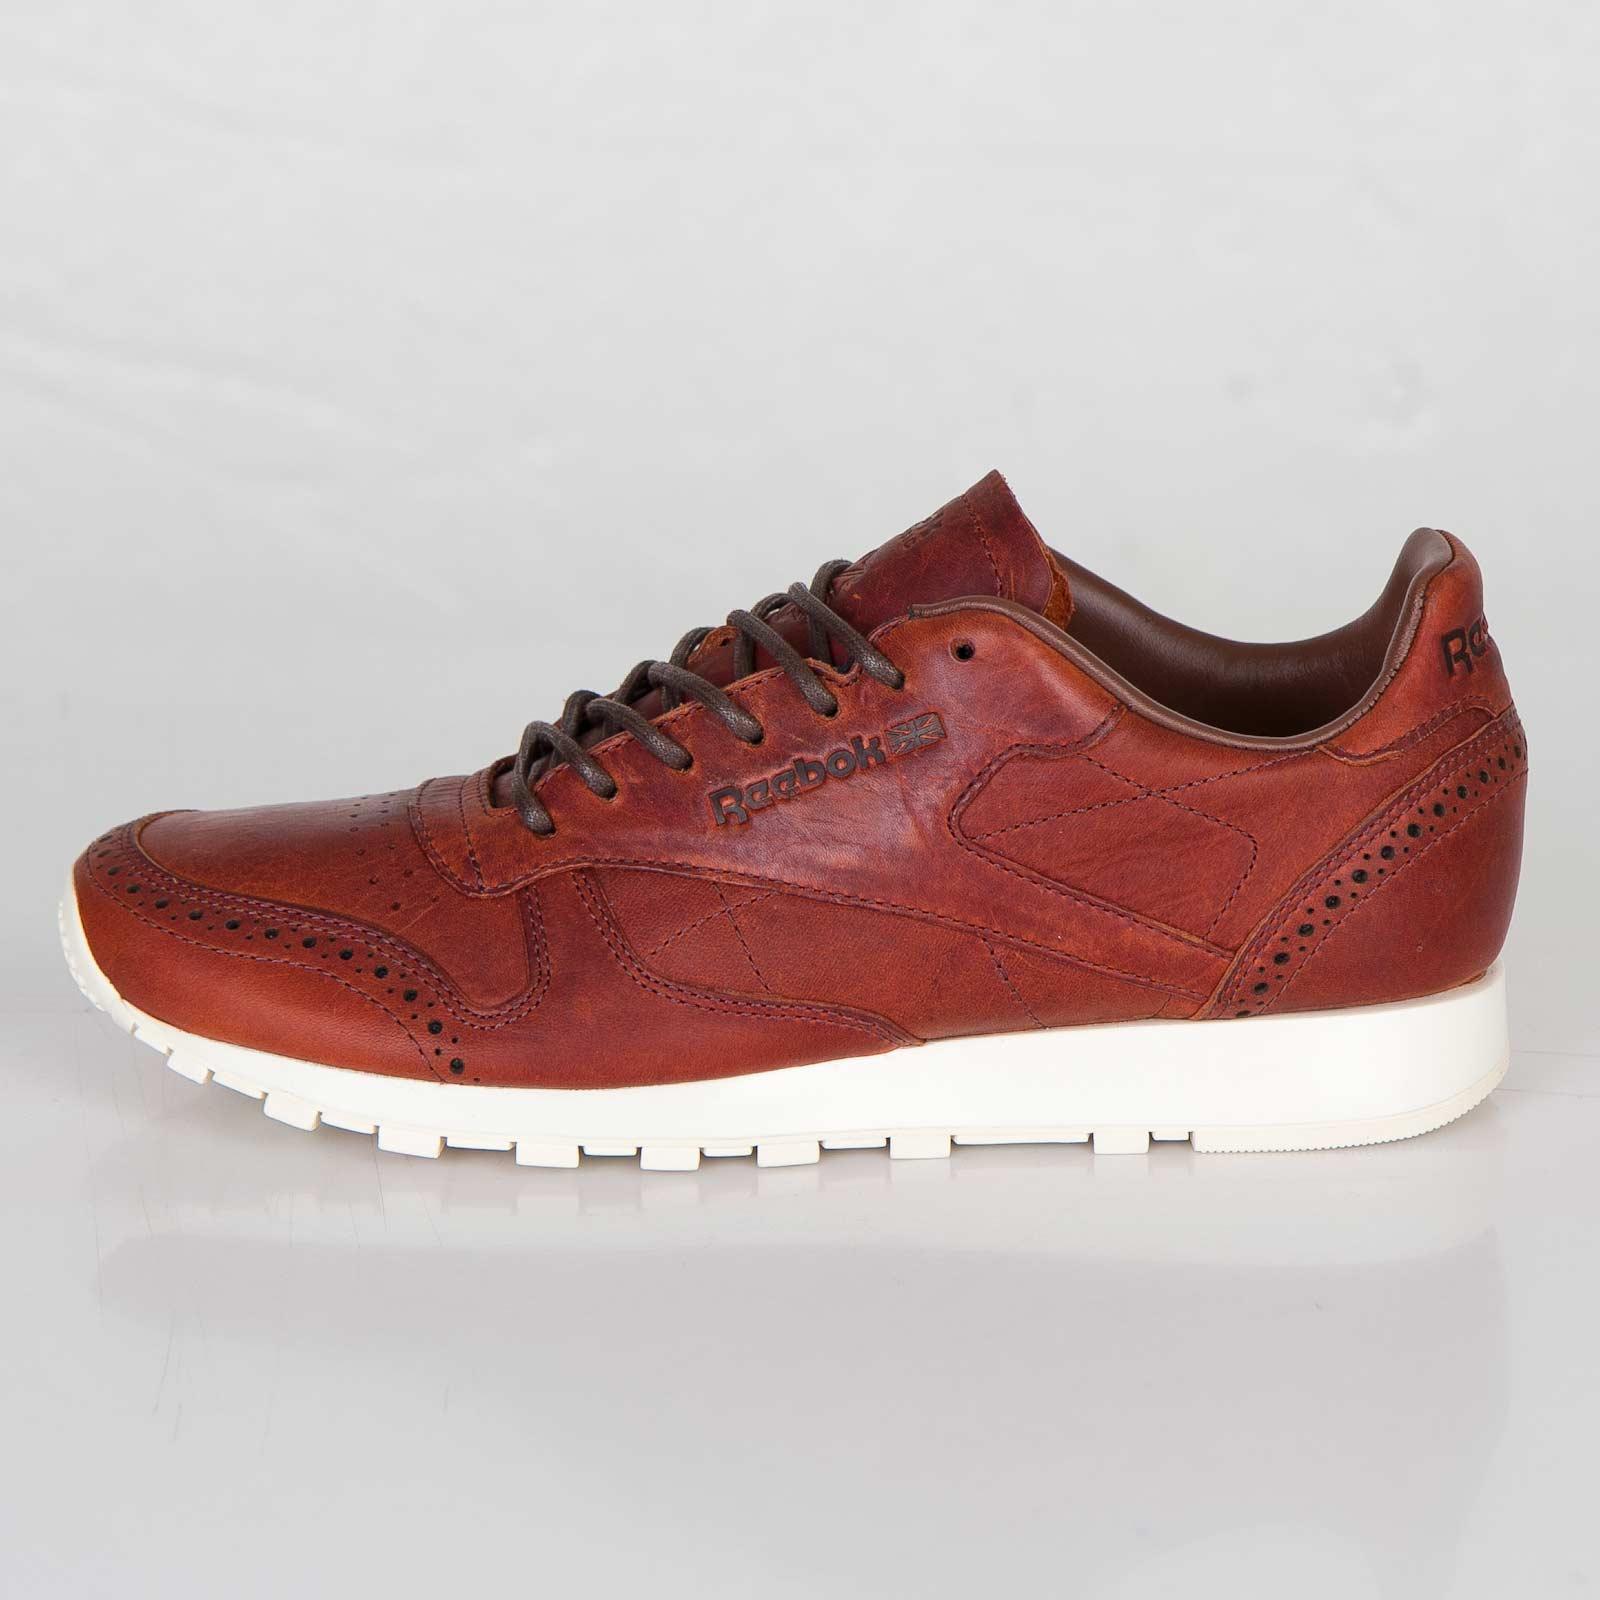 Reebok Classic Cf Sneakersnstuff Lux Leather V55142 Stead rnr6xfq